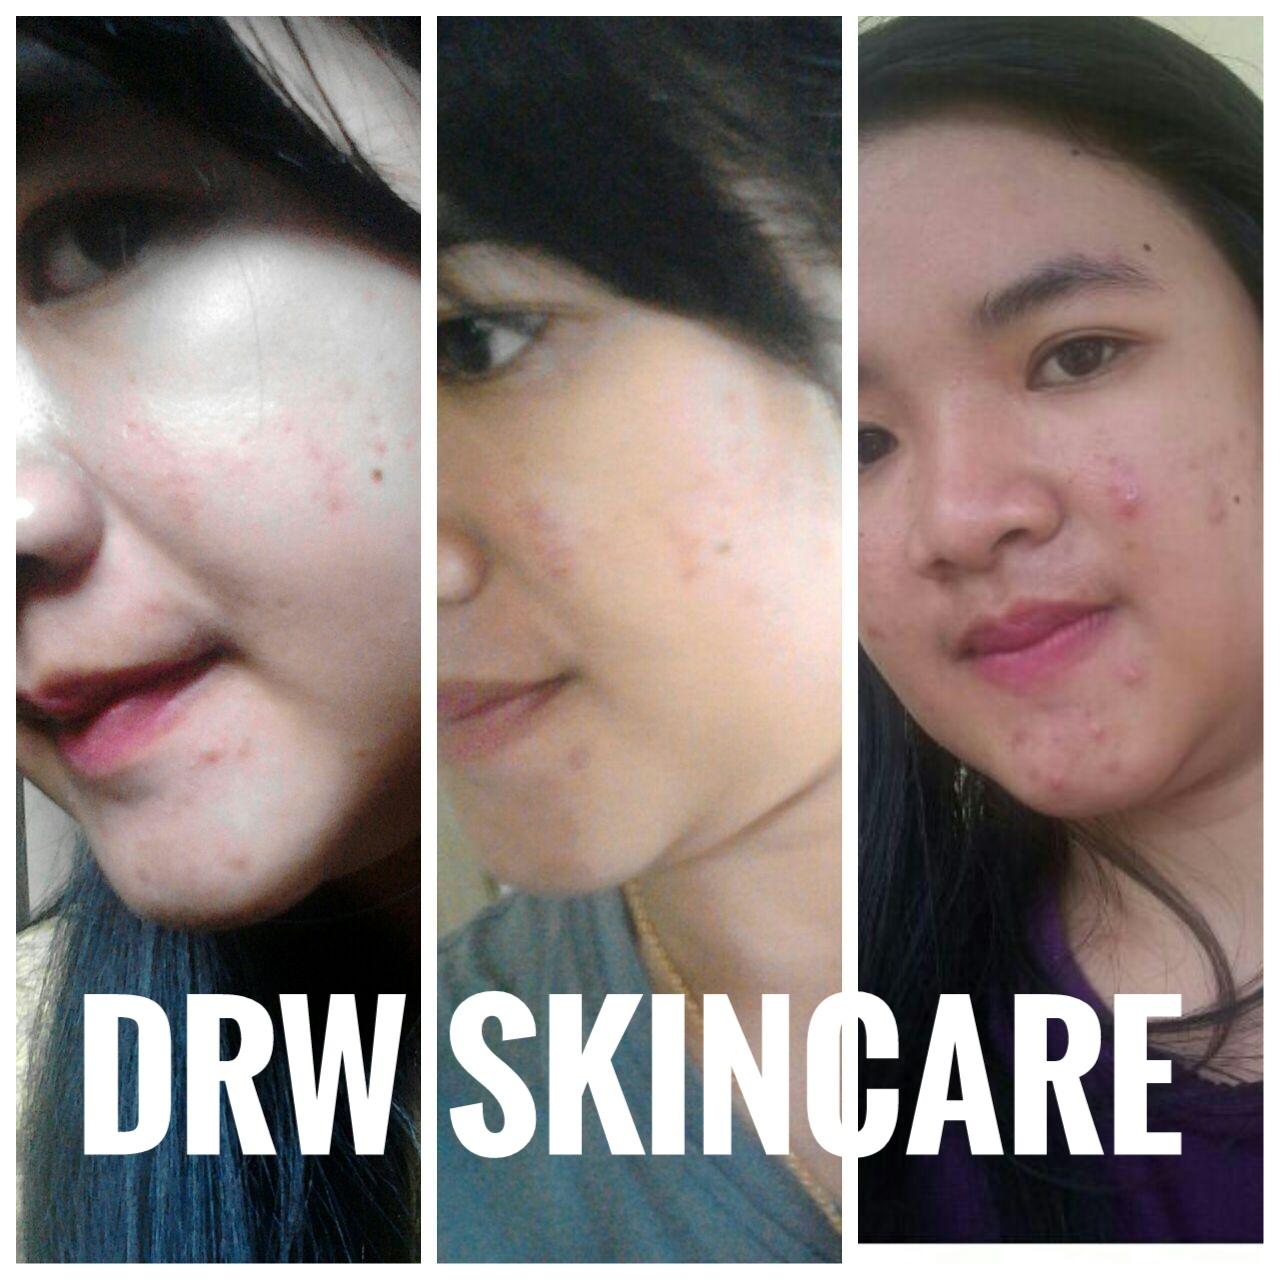 Testimoni Serum Acne Drw Skincare Skin Care 0822 1111 0407 Published At 1280 In